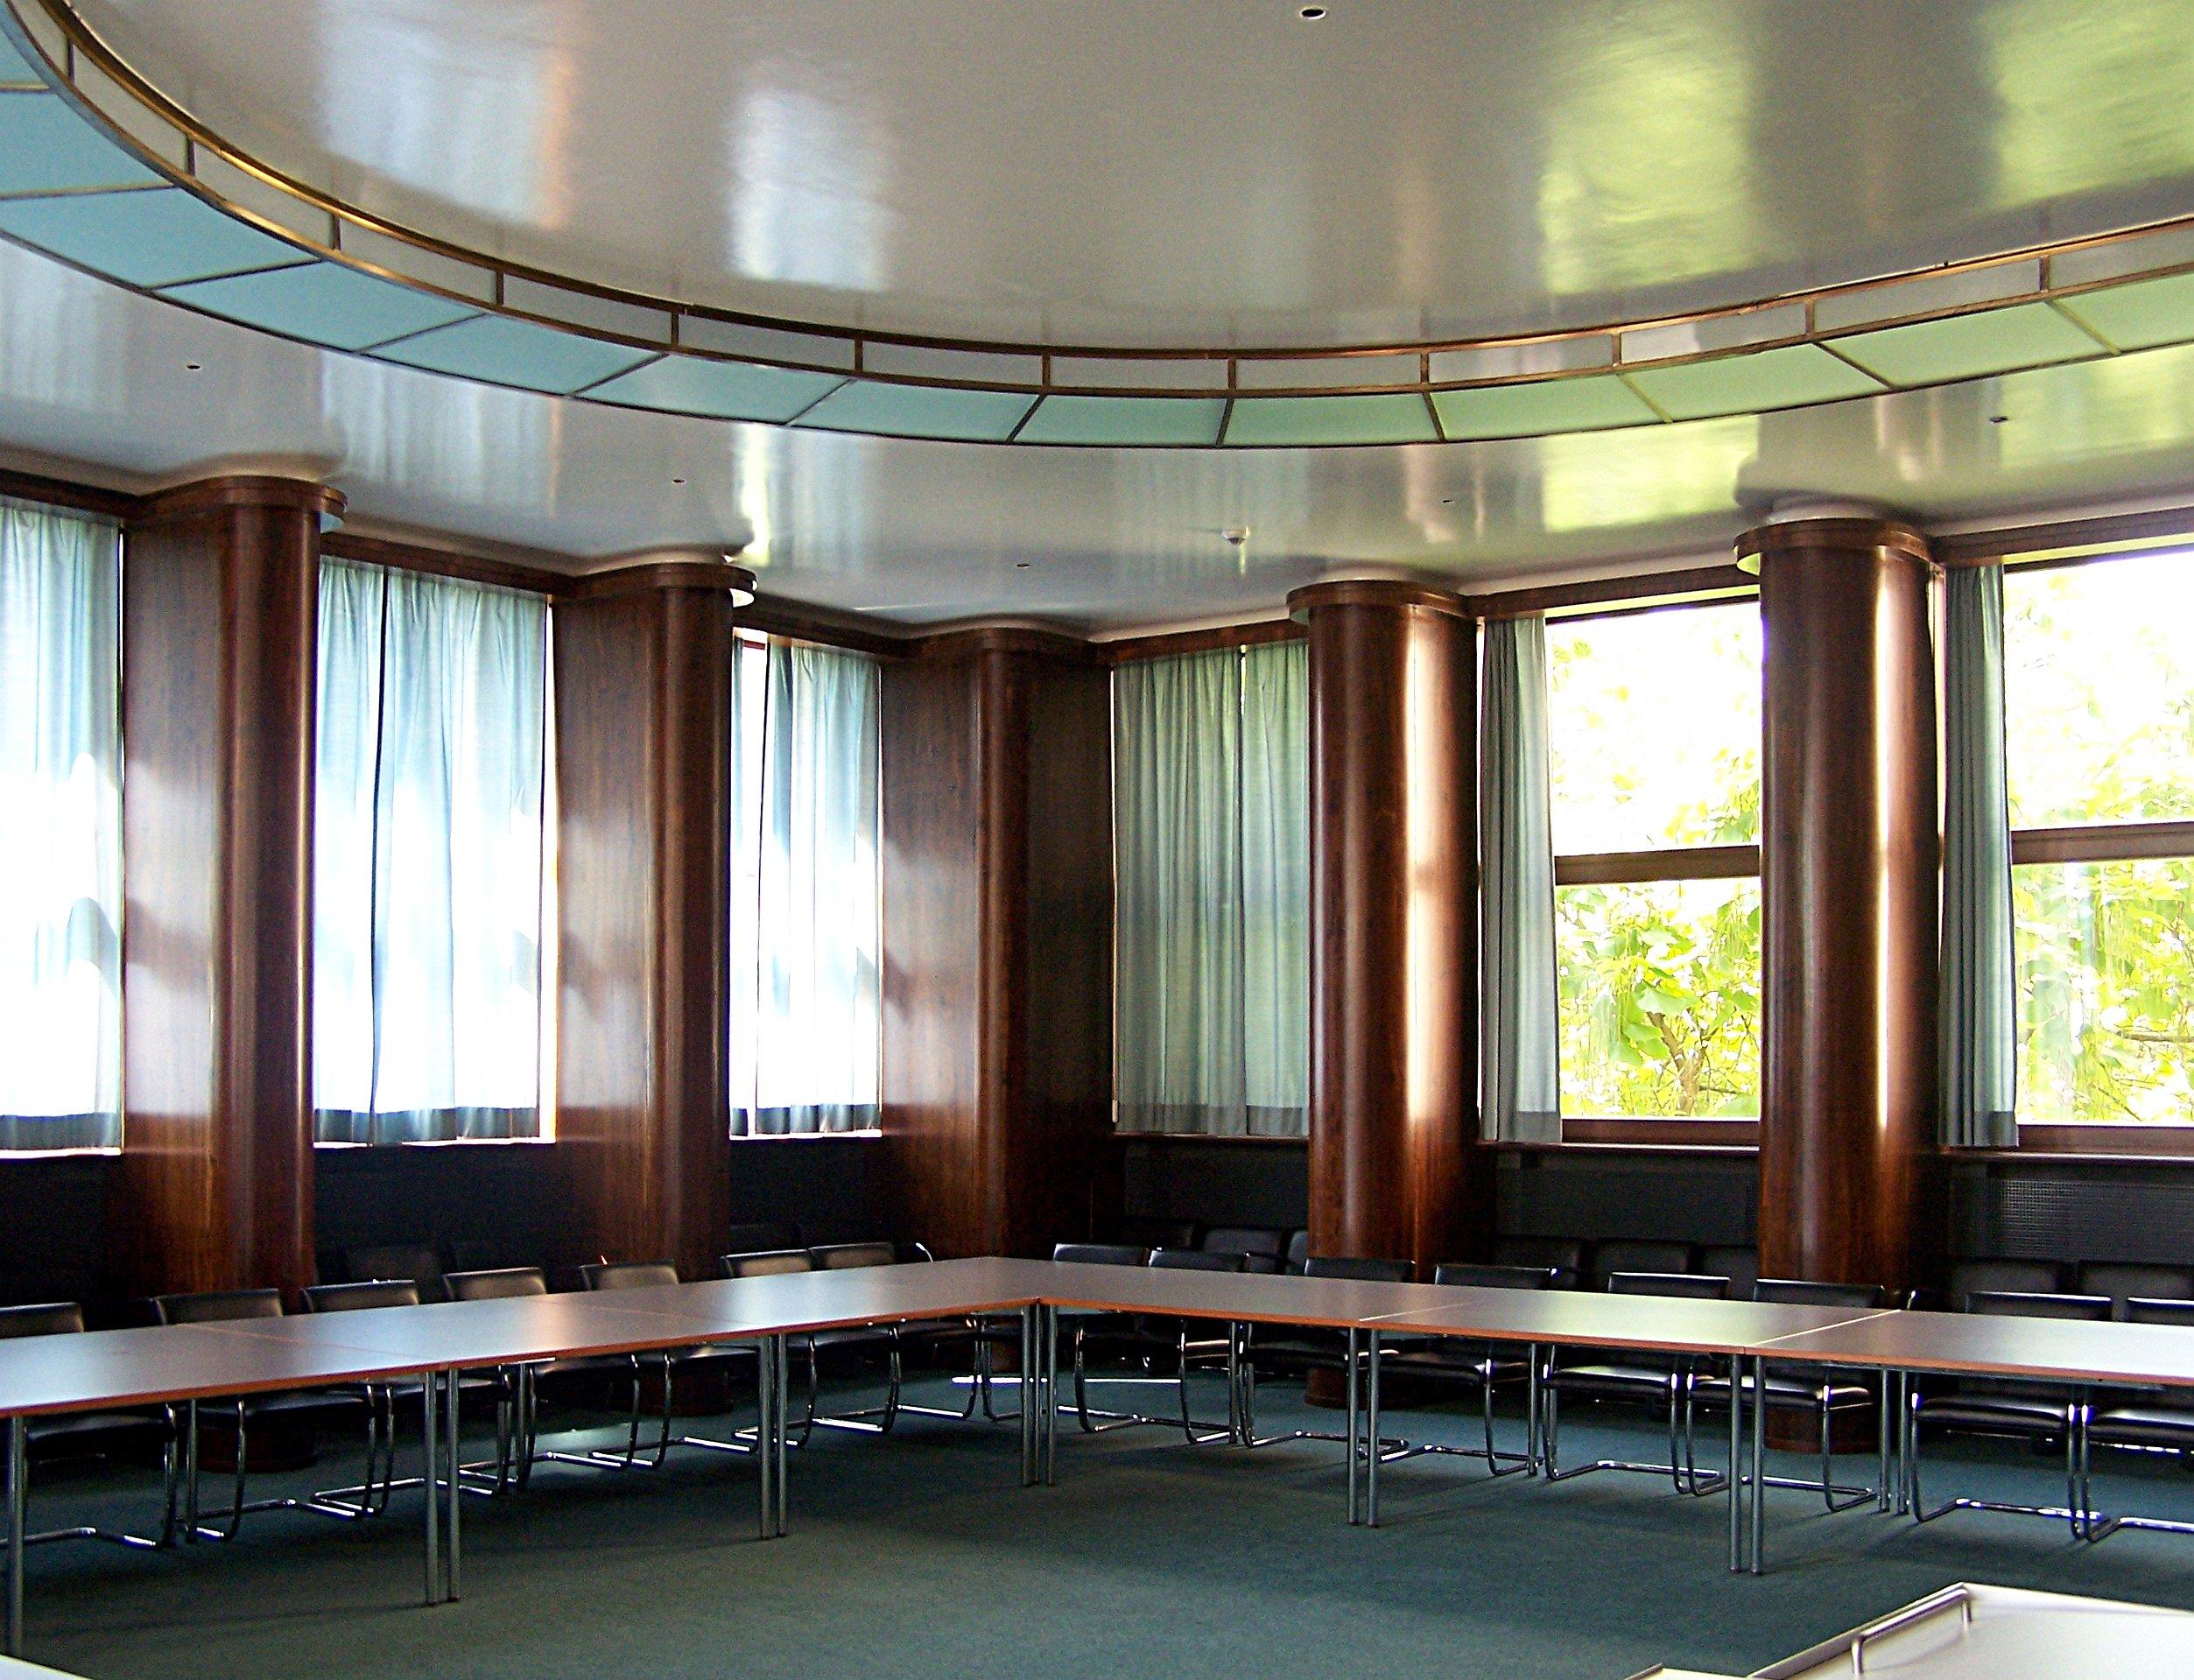 File:Eisenhower-Saal im I.G.-Farben-Haus.jpg - Wikimedia Commons